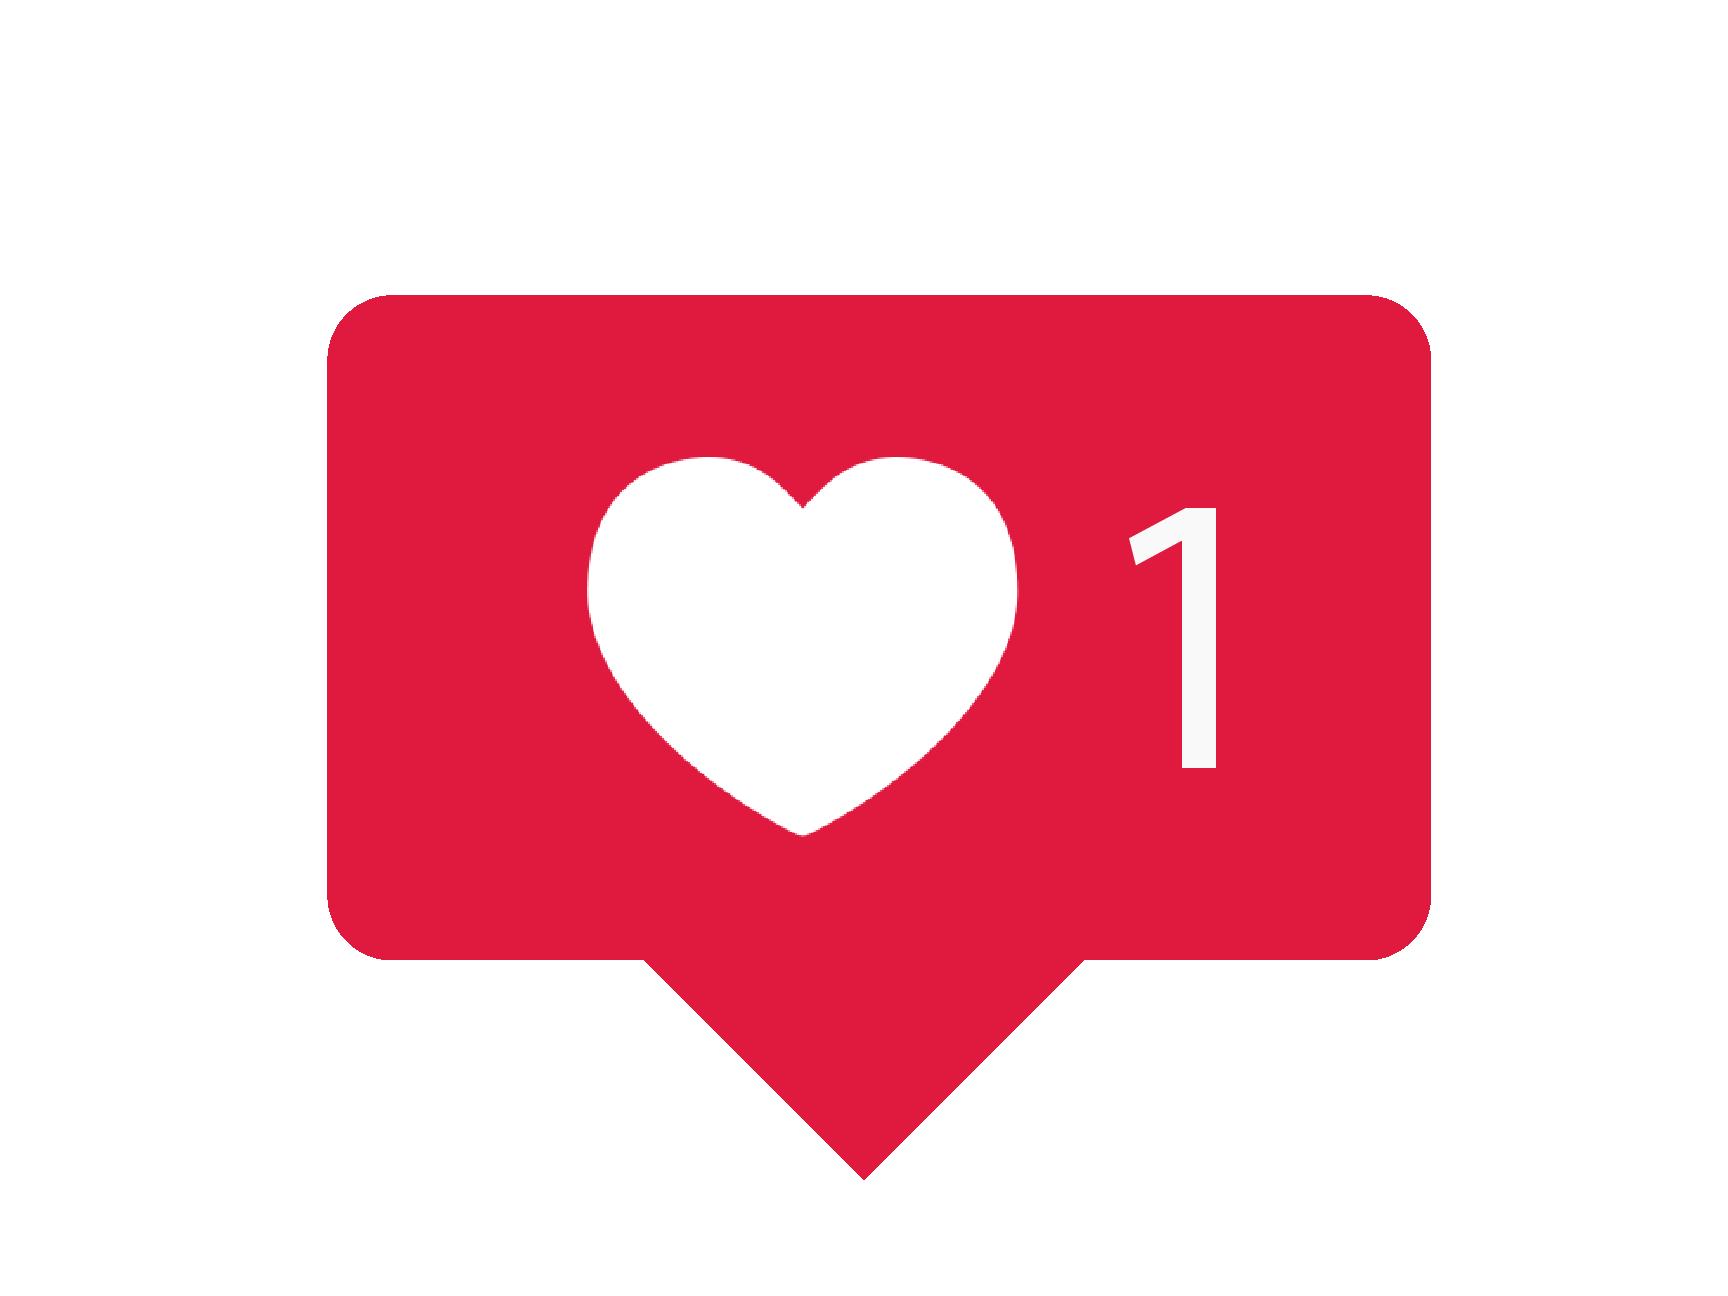 instagram love stiker story comment icon logo 92272